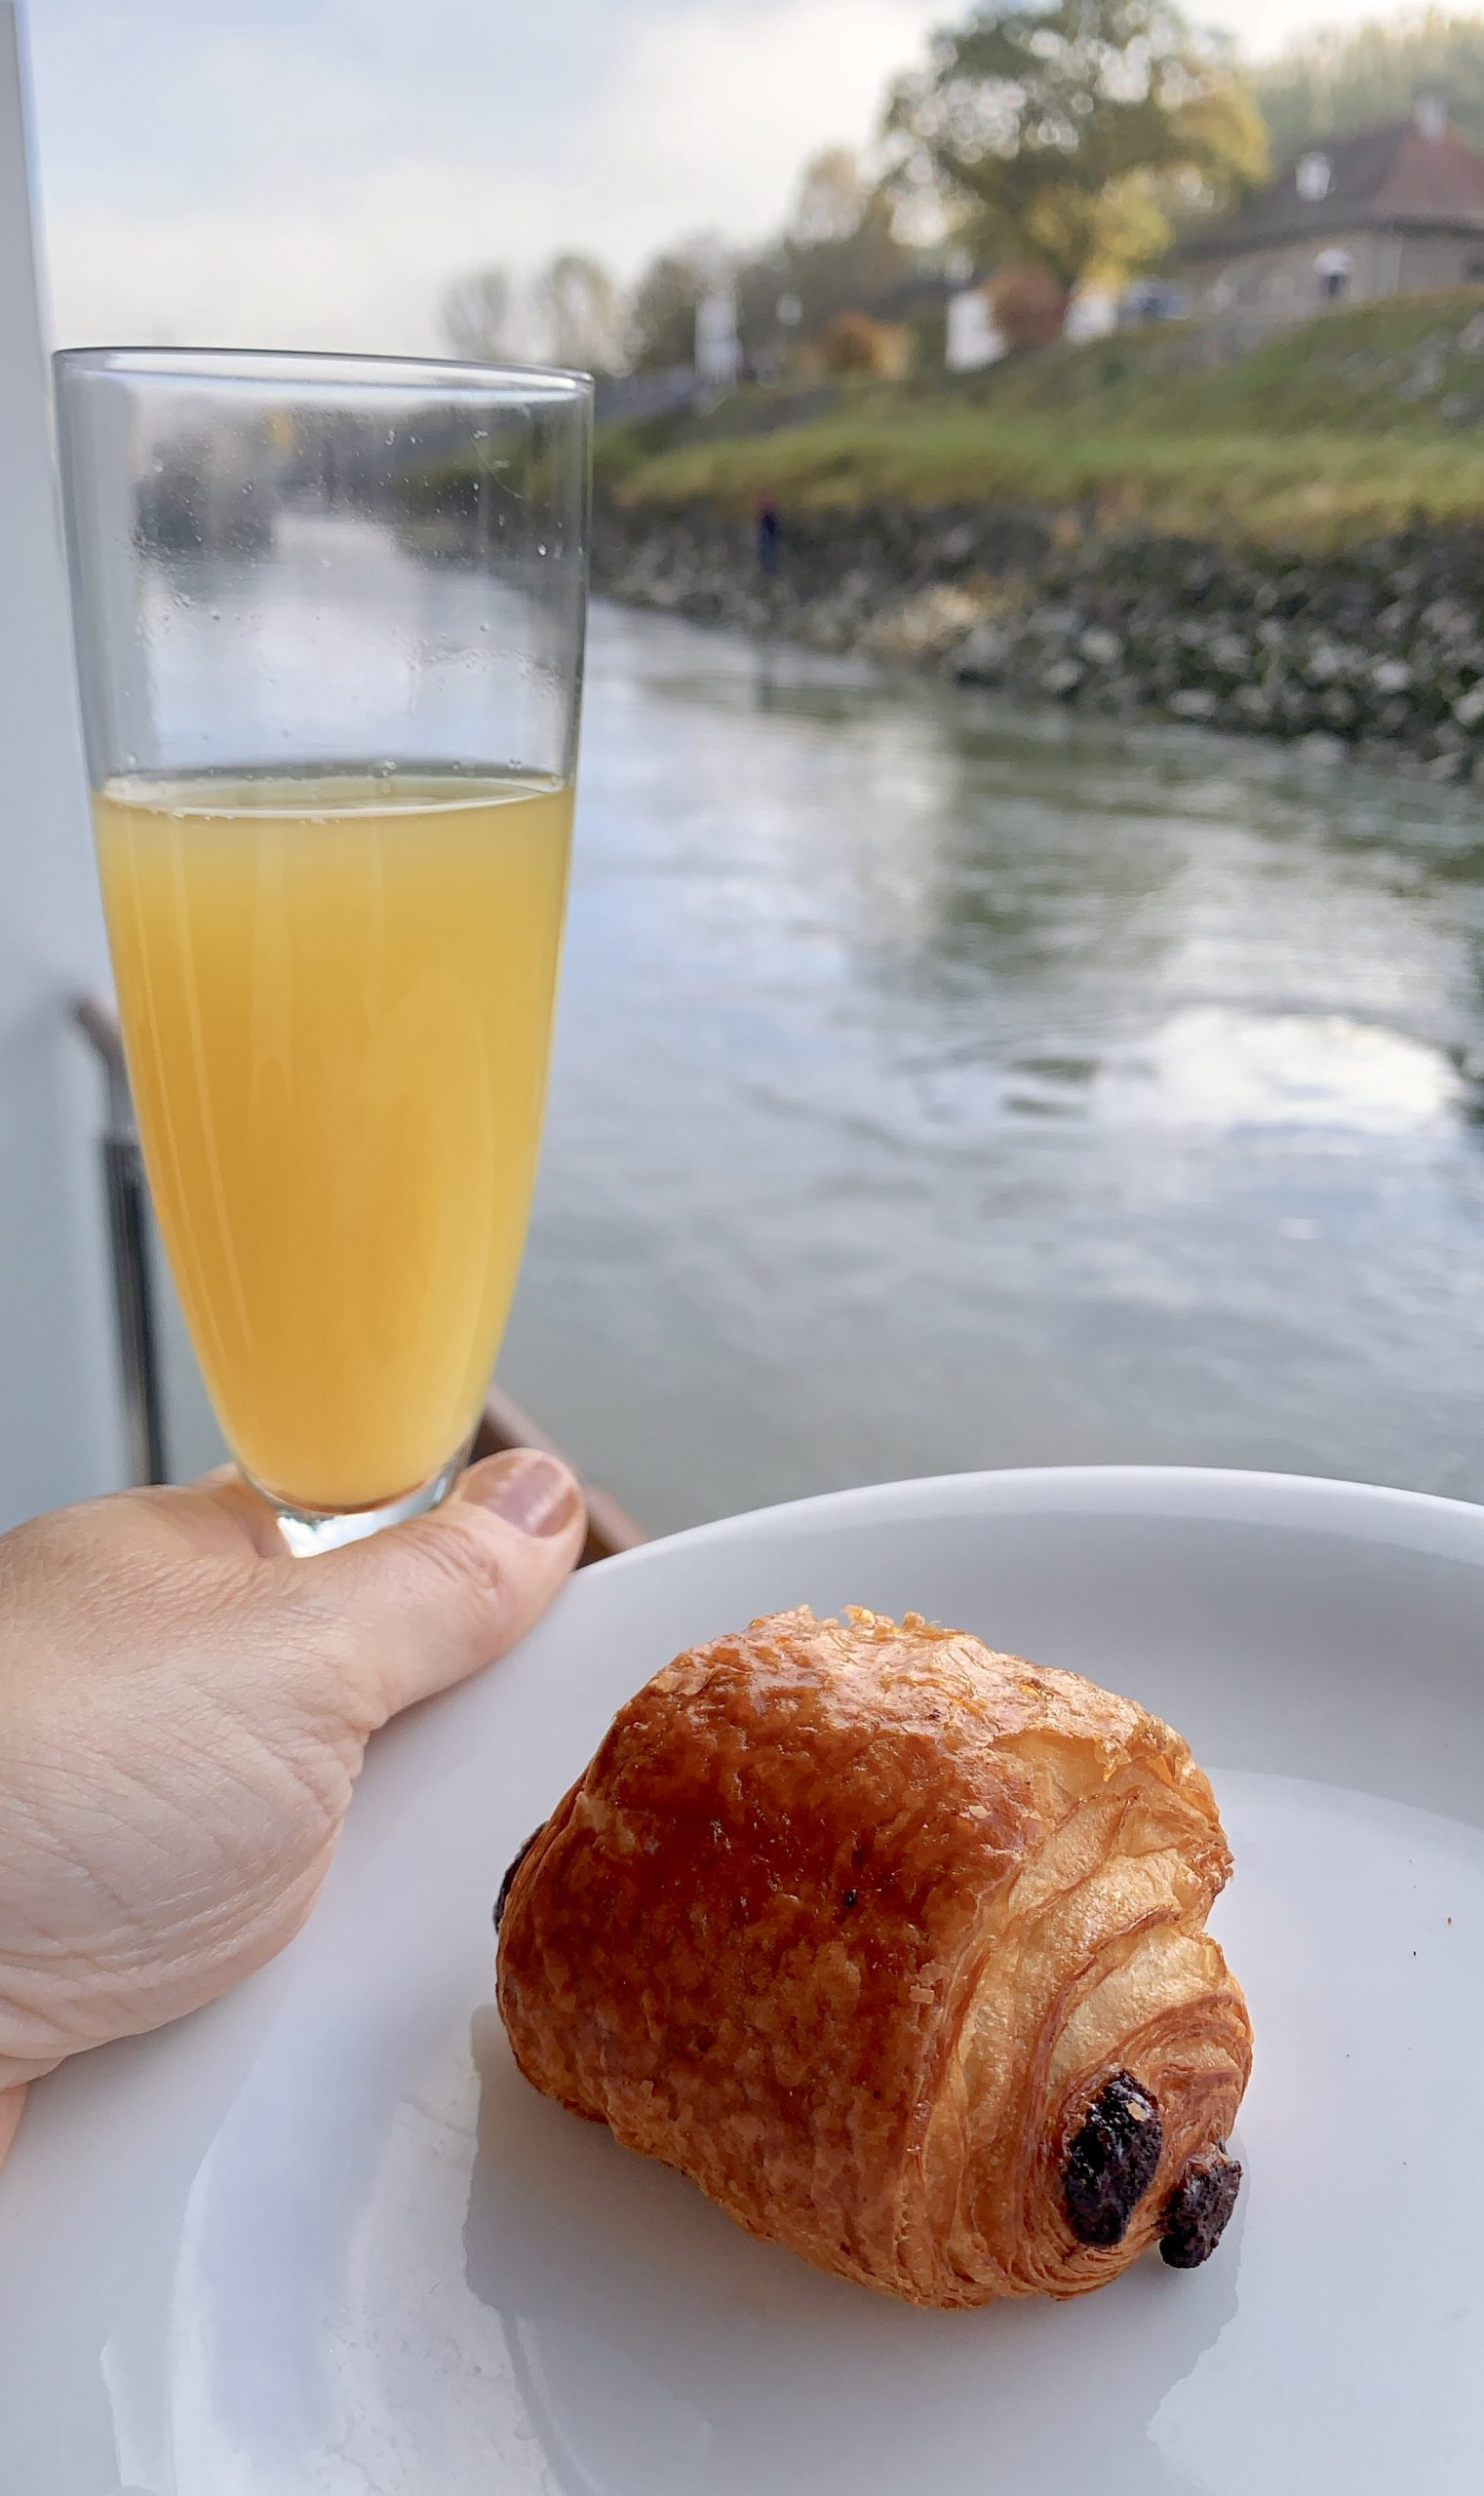 breakfast on the AmaMagna when visiting Weissenkirchen